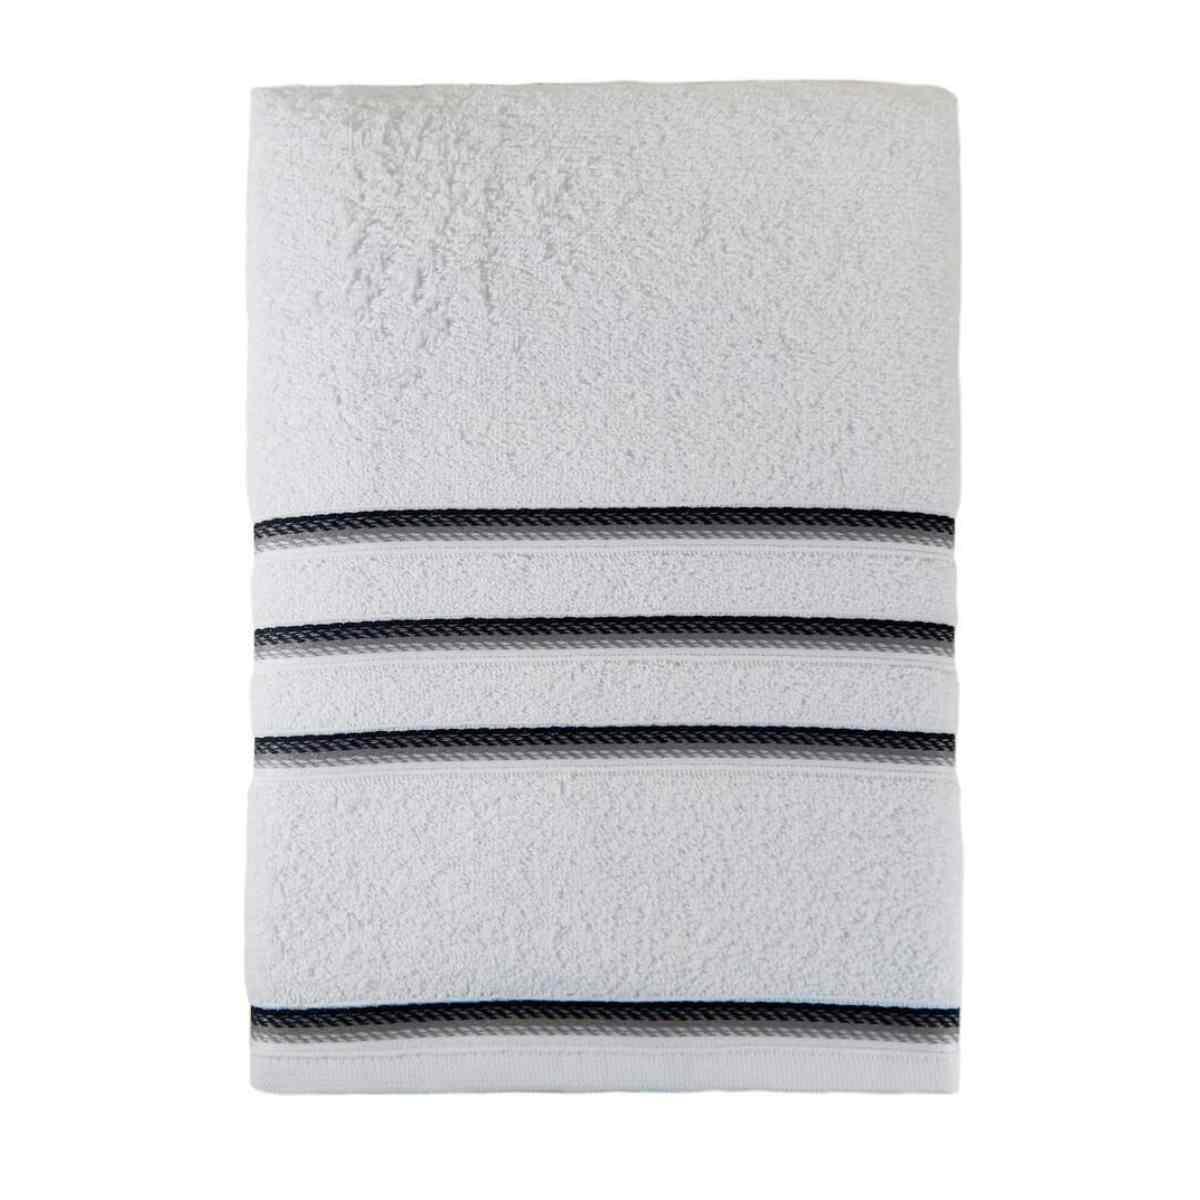 Toalha rosto classic 45x68 Branco Com Preto